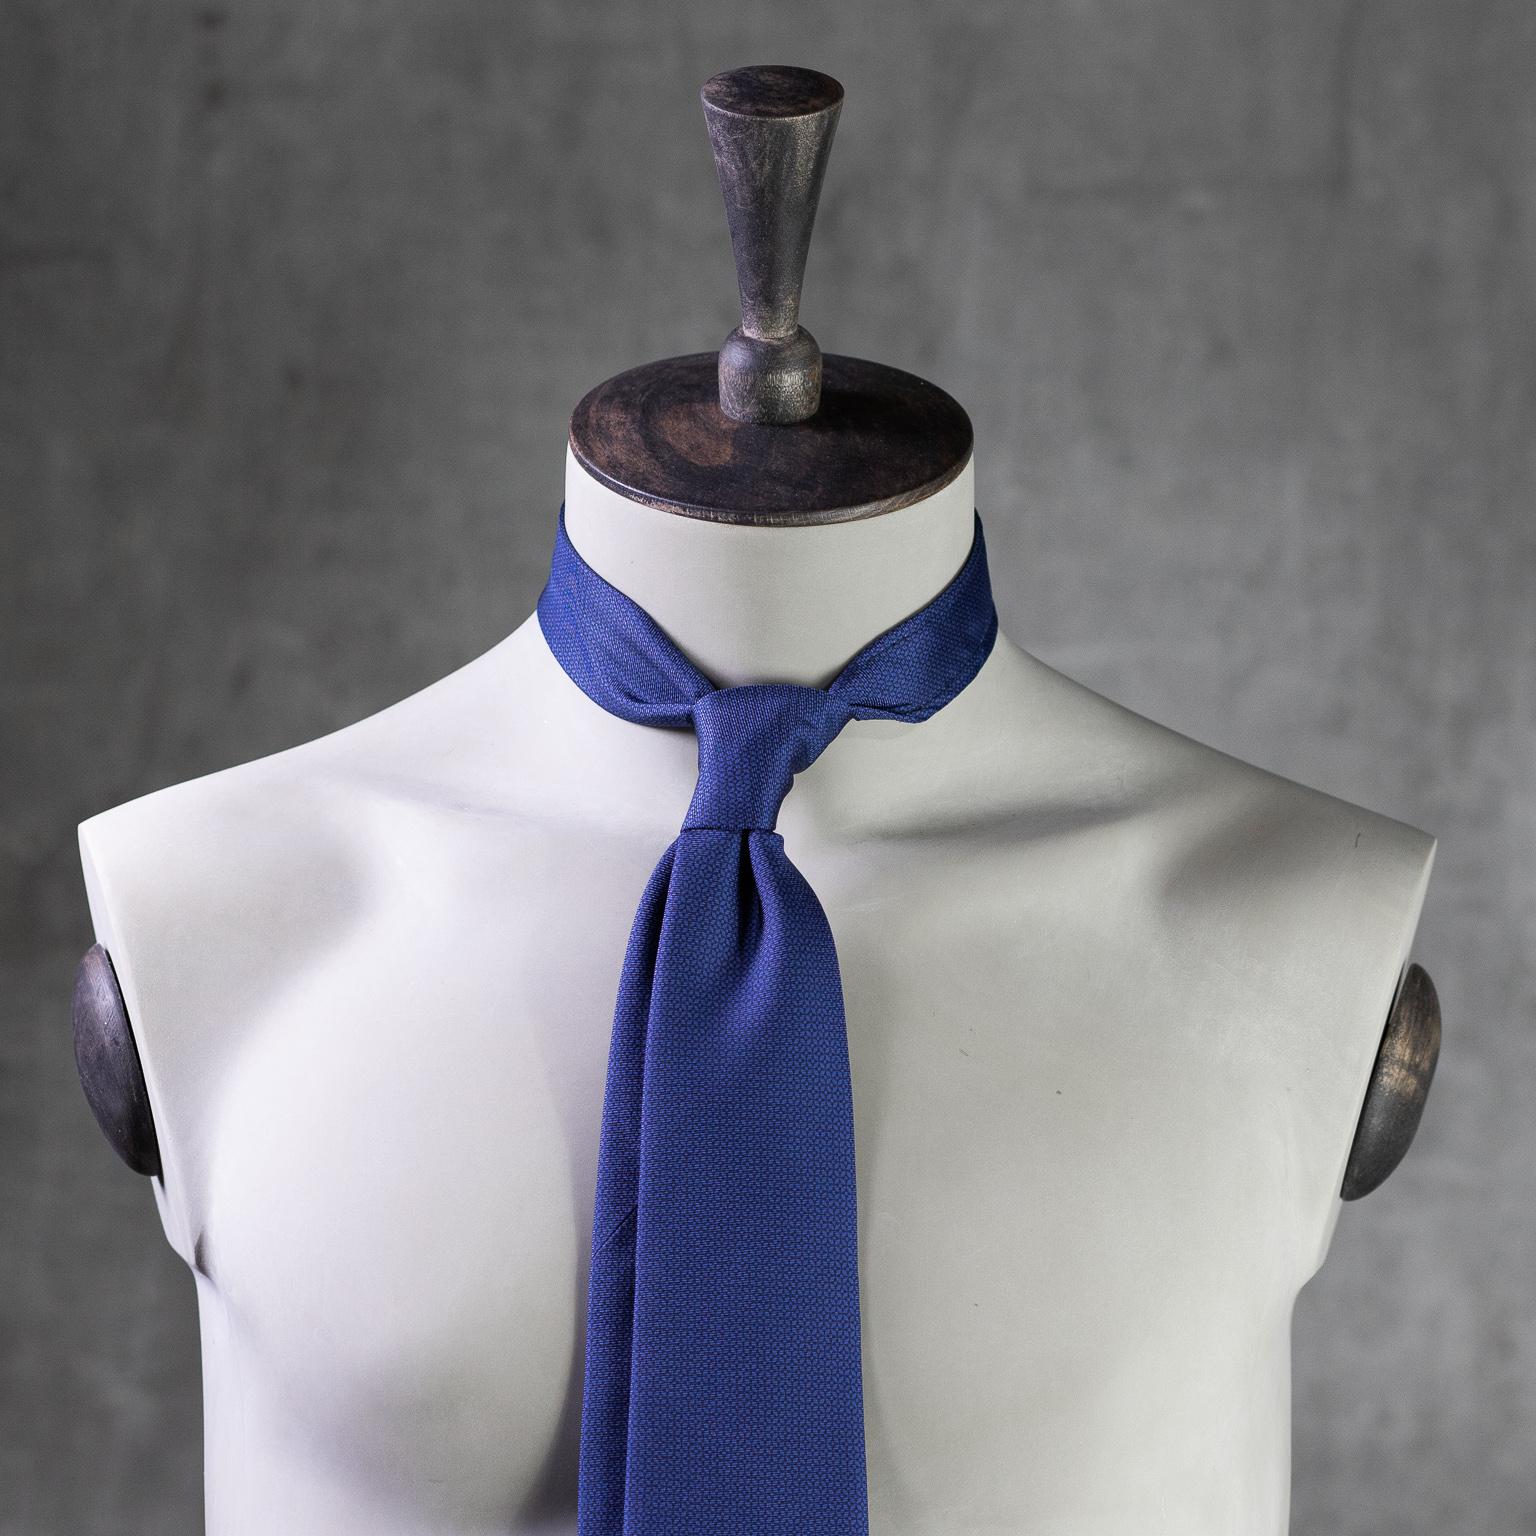 PRINTED-SILK-SEDA-ESTAMPADA-0572-Tie-Initials-Corbata-Iniciales-The-Seëlk-2